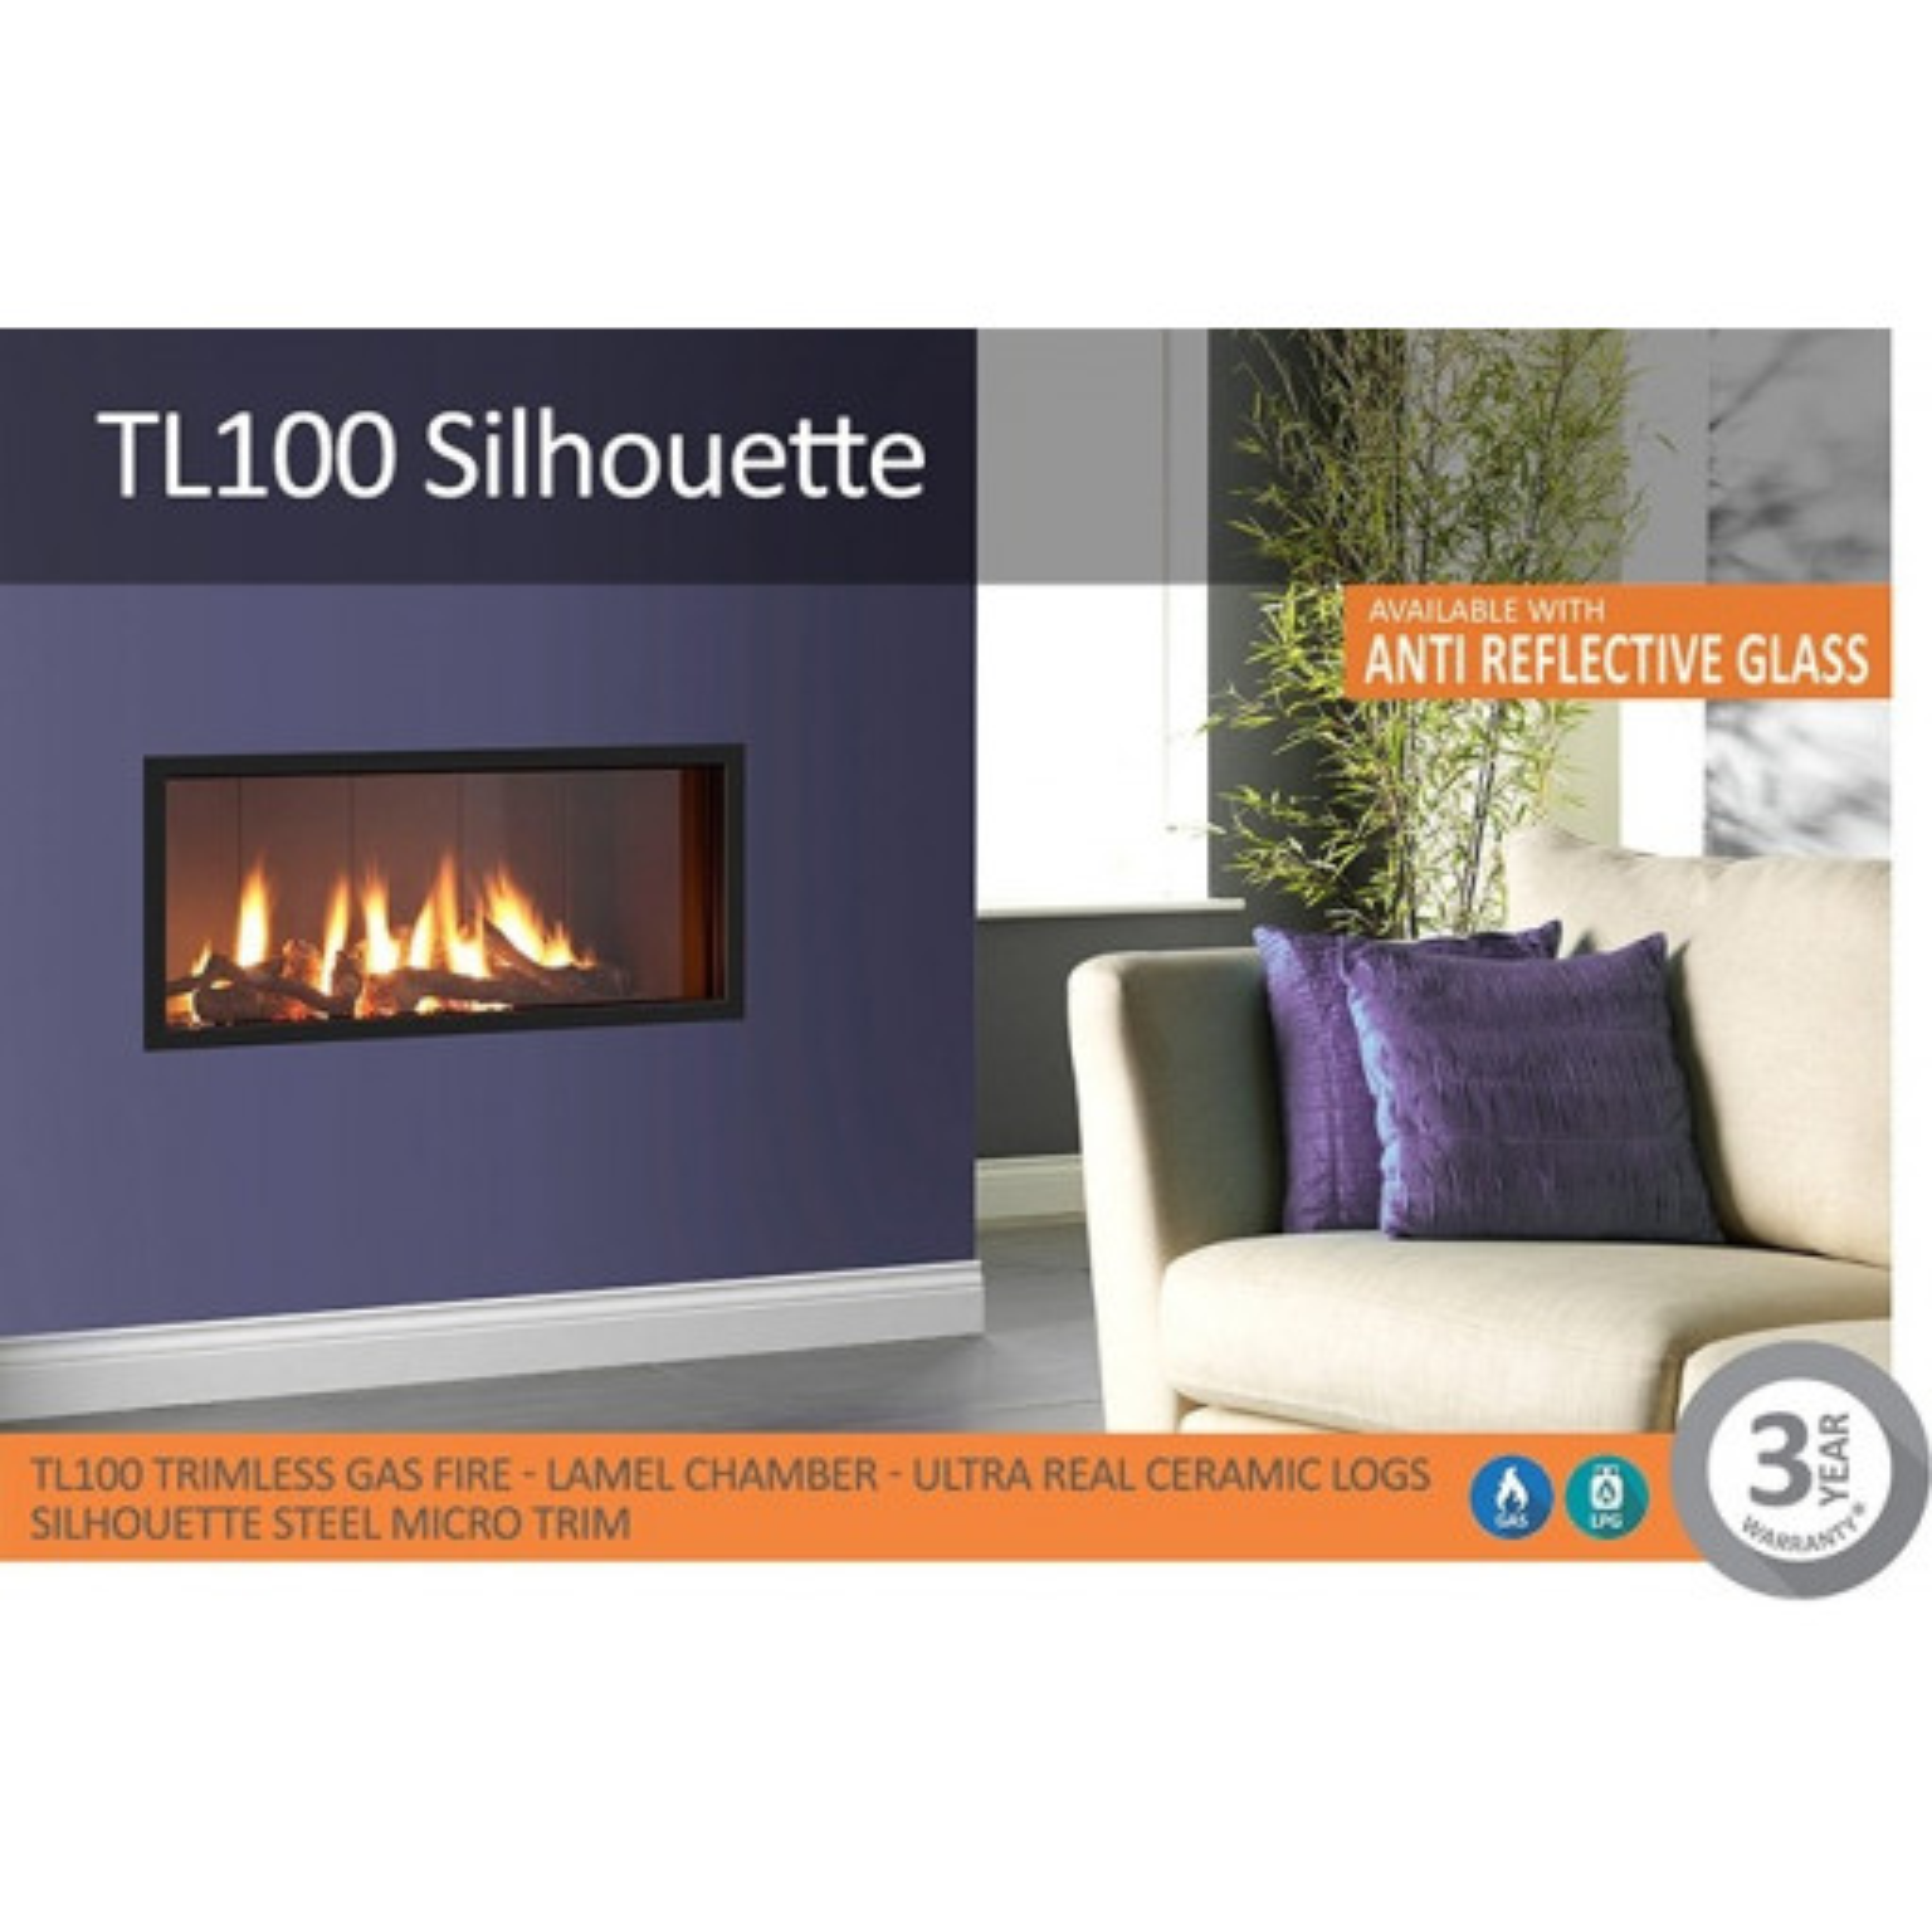 Vision Trimline TL100 Silhouette